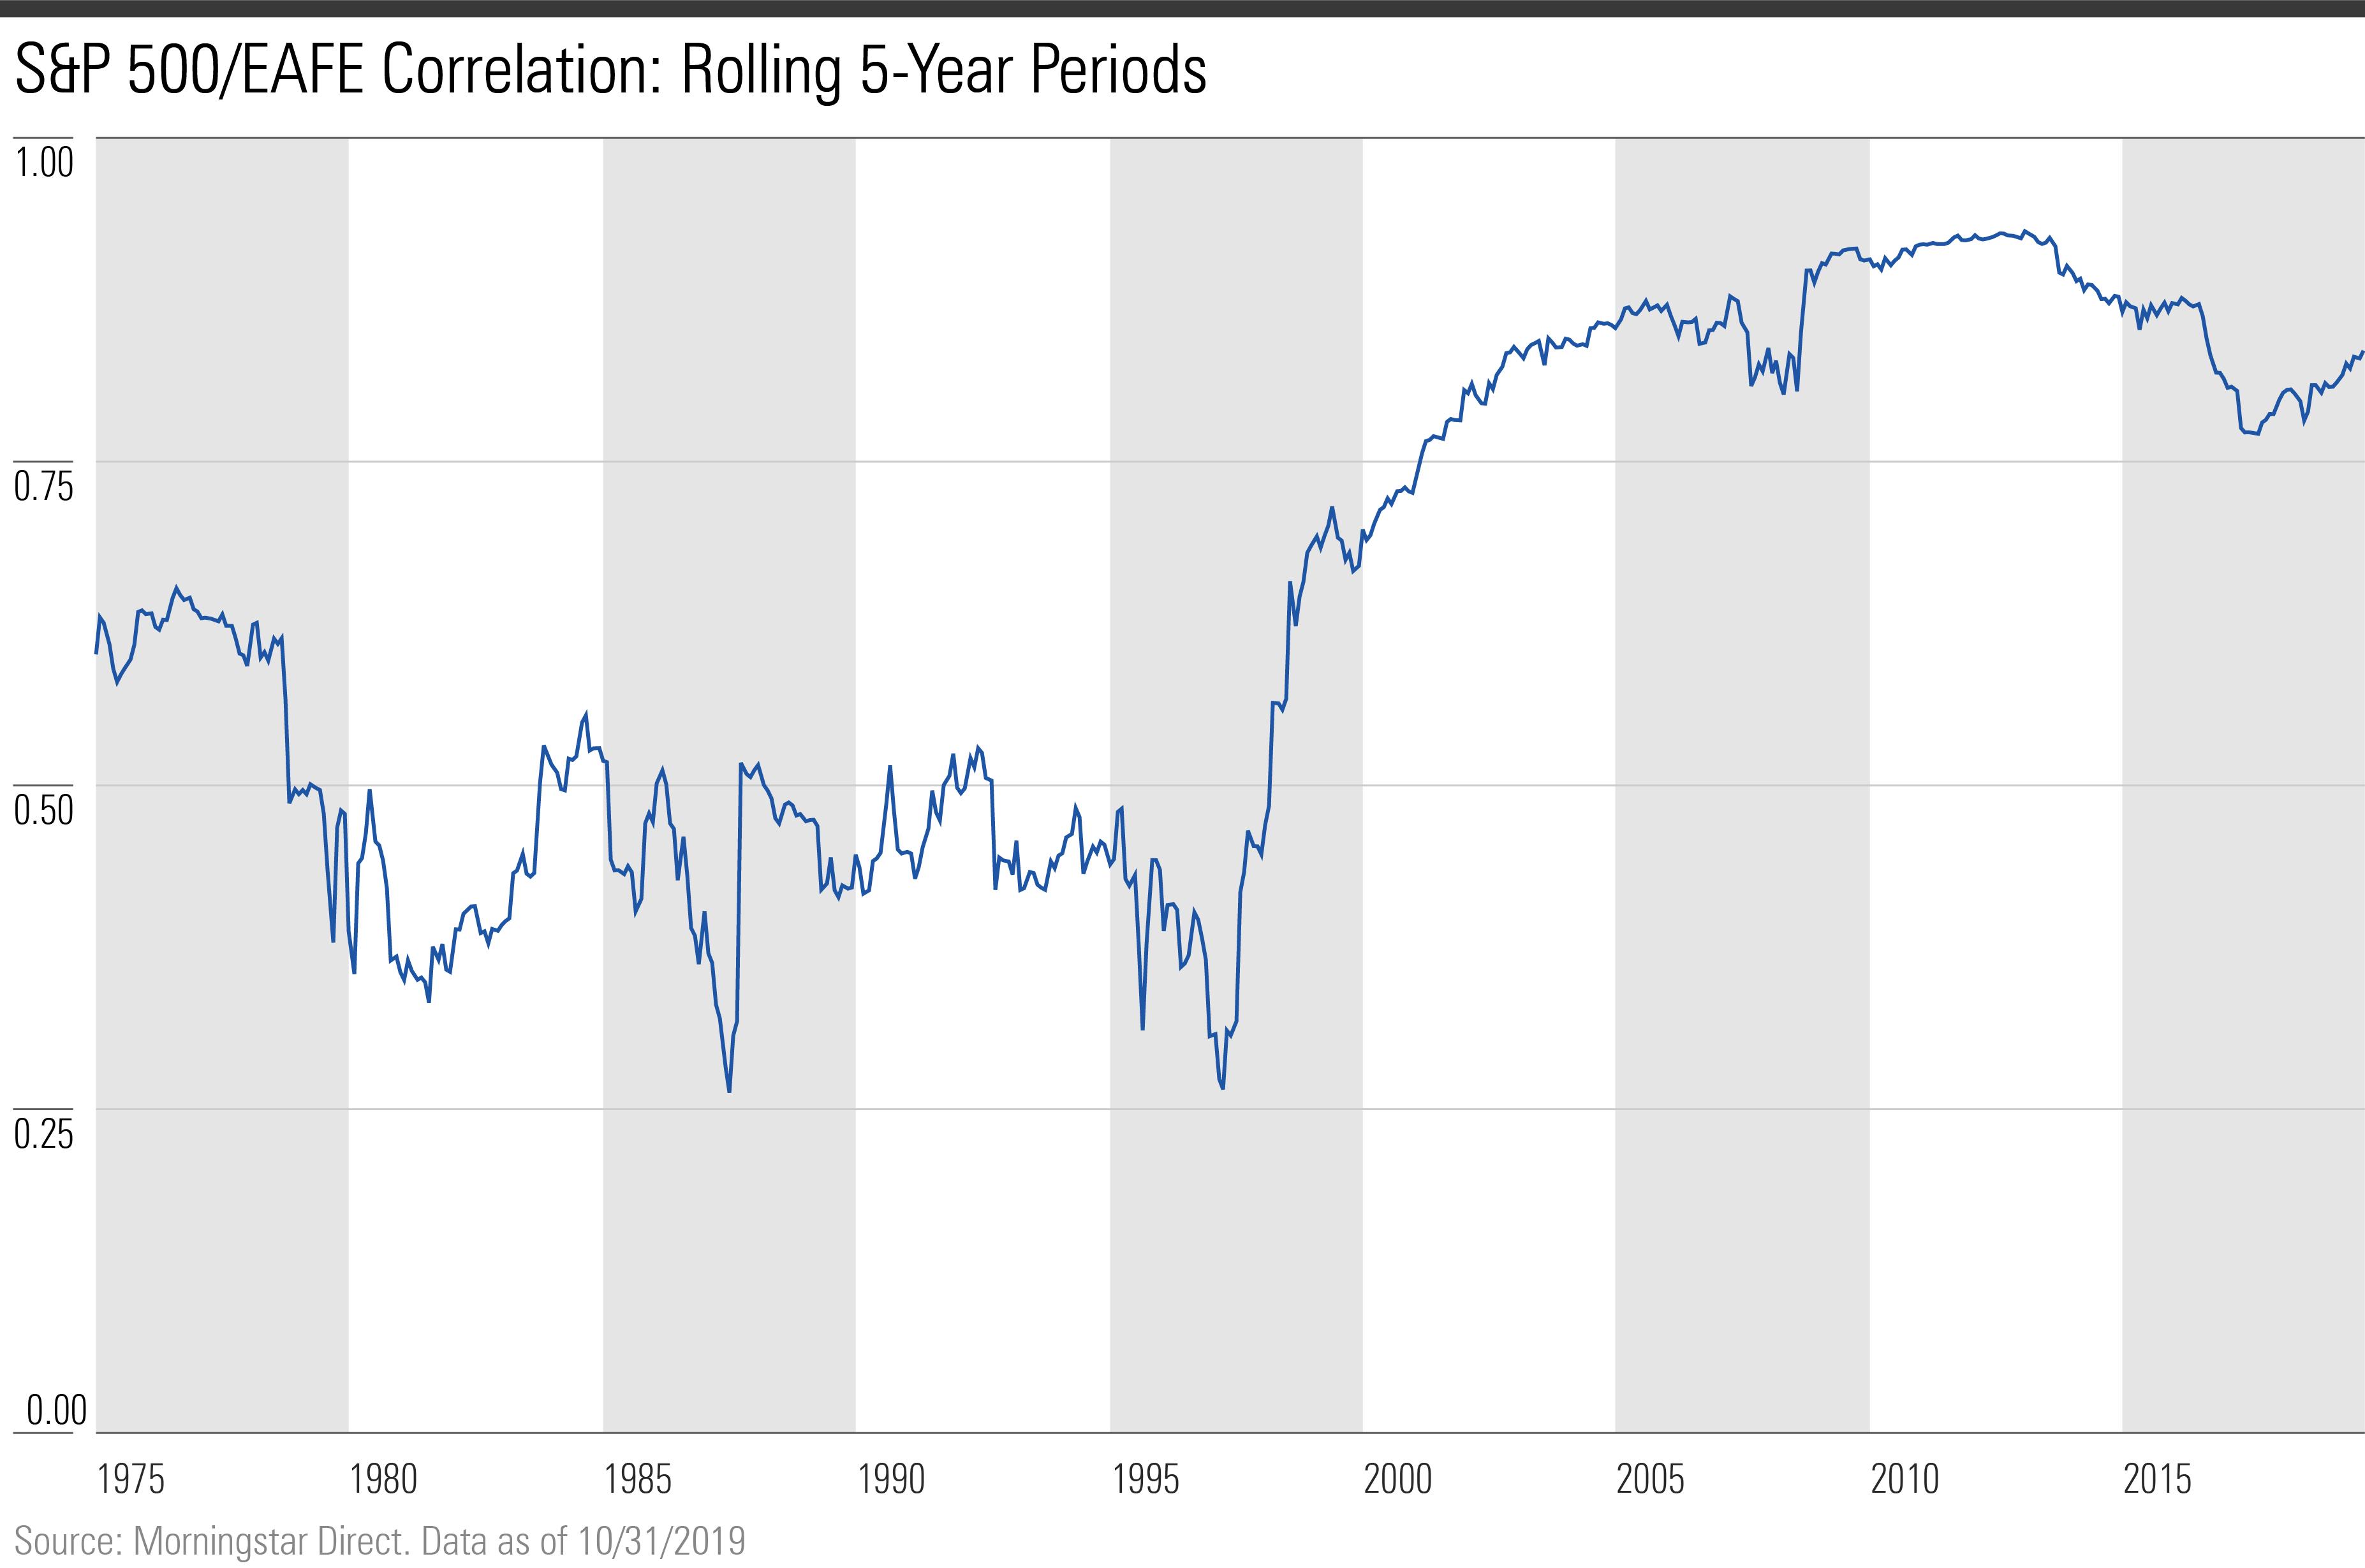 International diversification - rising global correlations 1